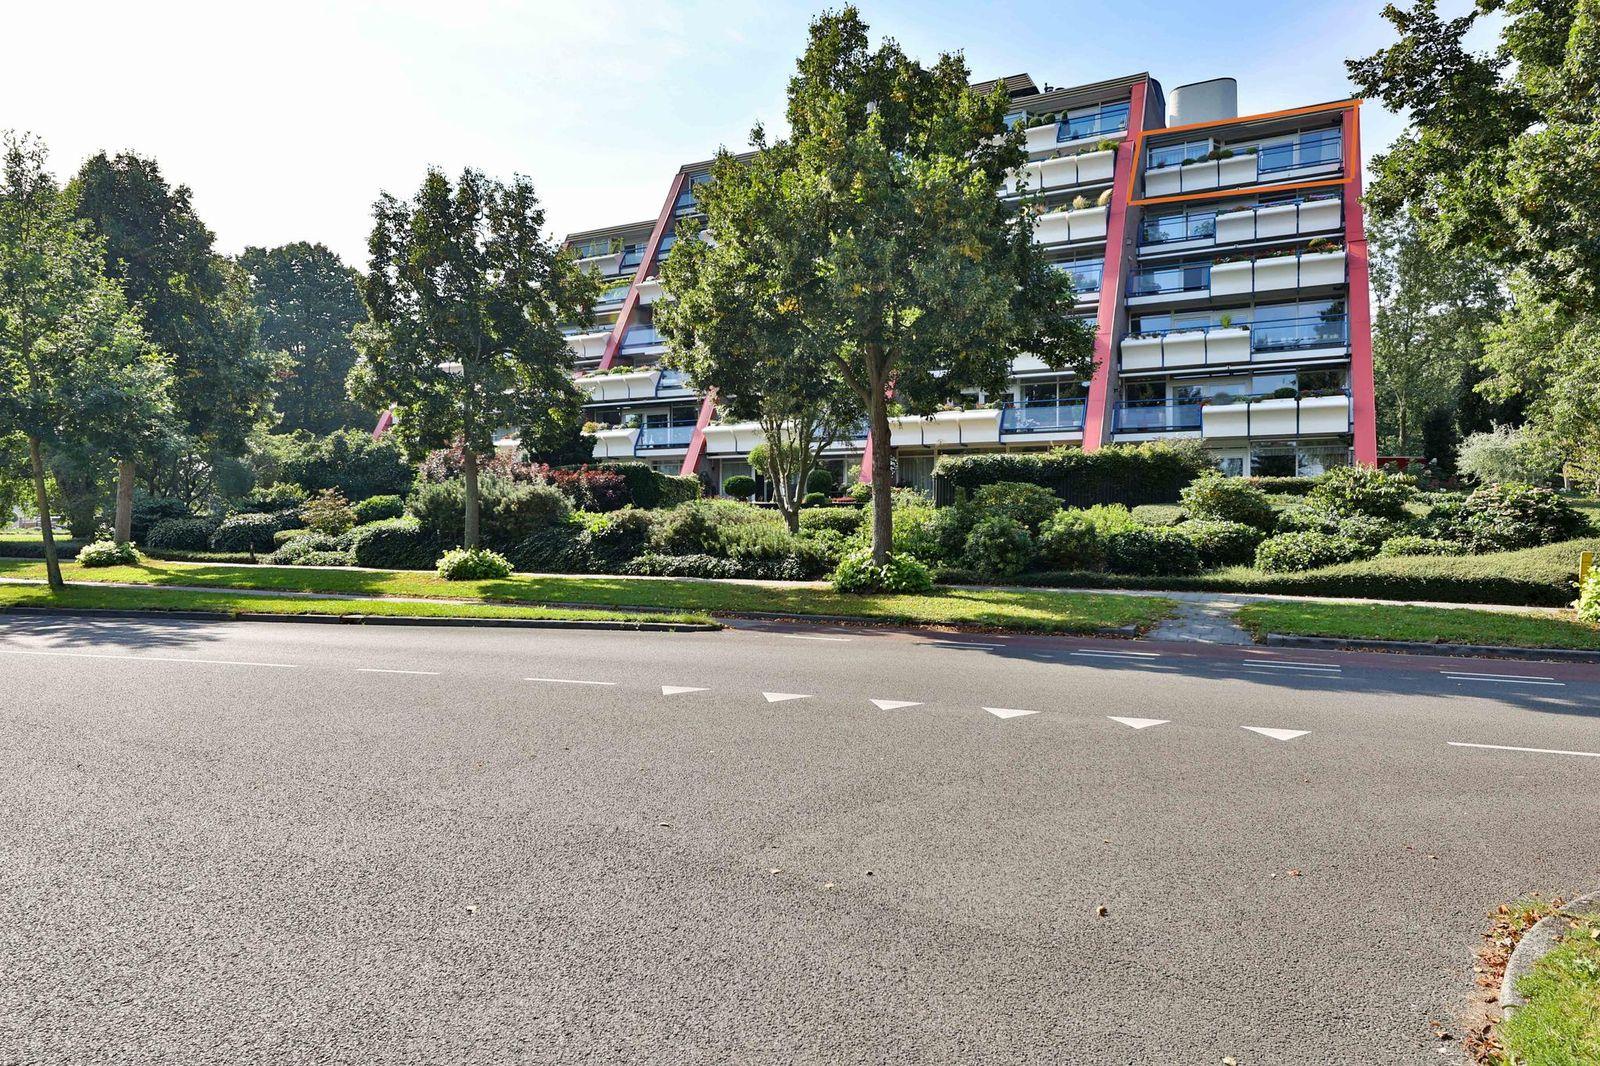 Alteveerstraat 202, Hoogeveen